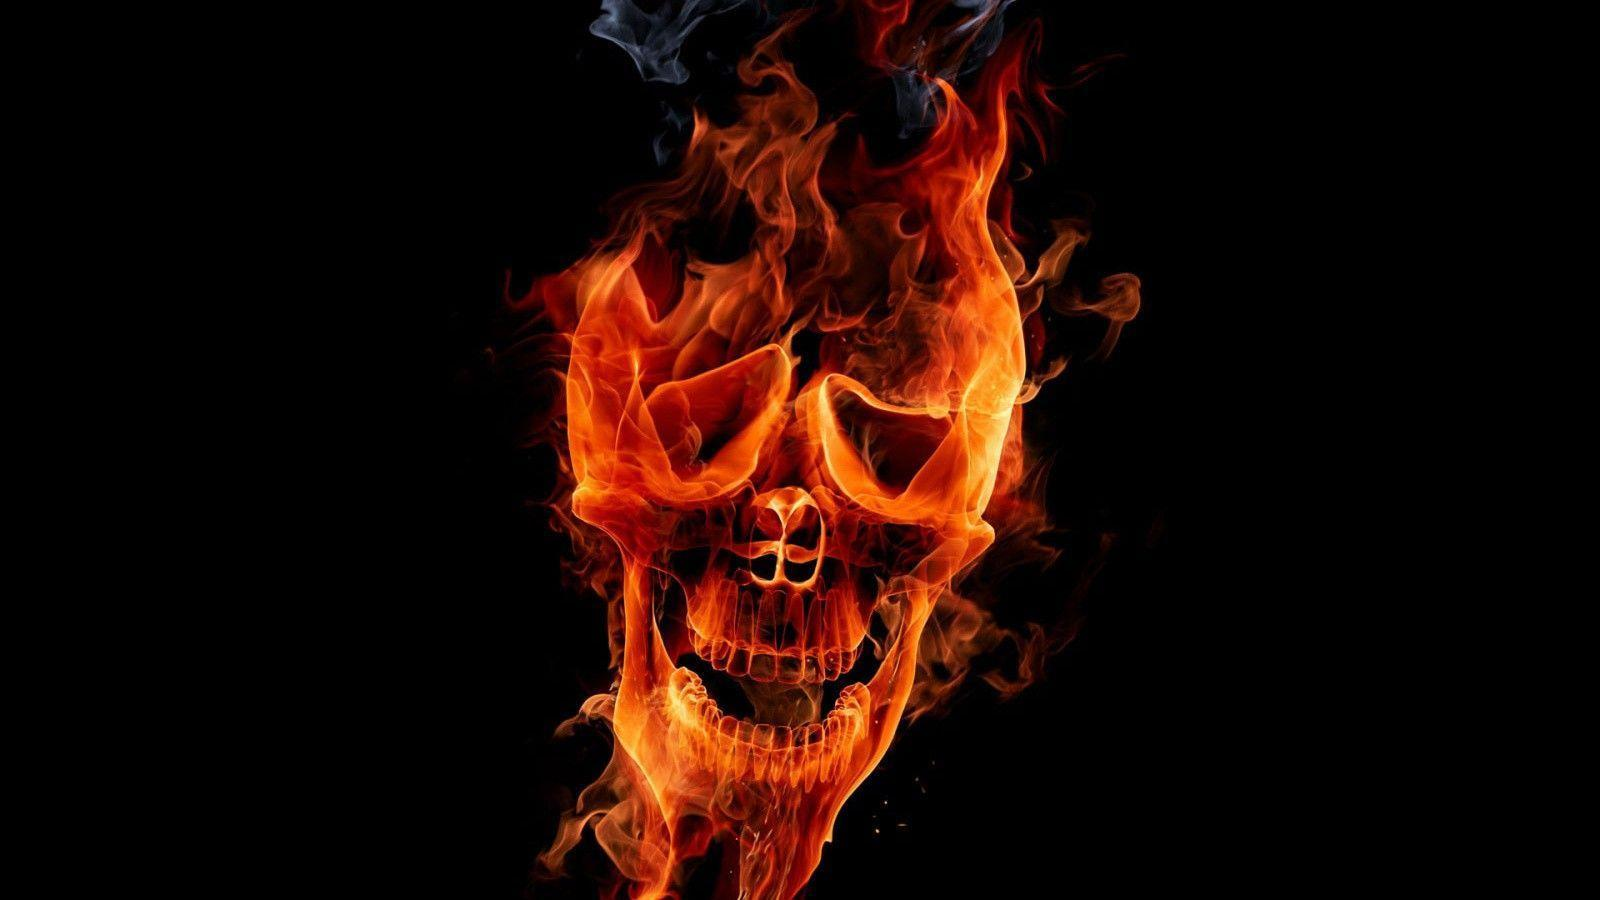 Flaming Skull Wallpapers Wallpaper Cave